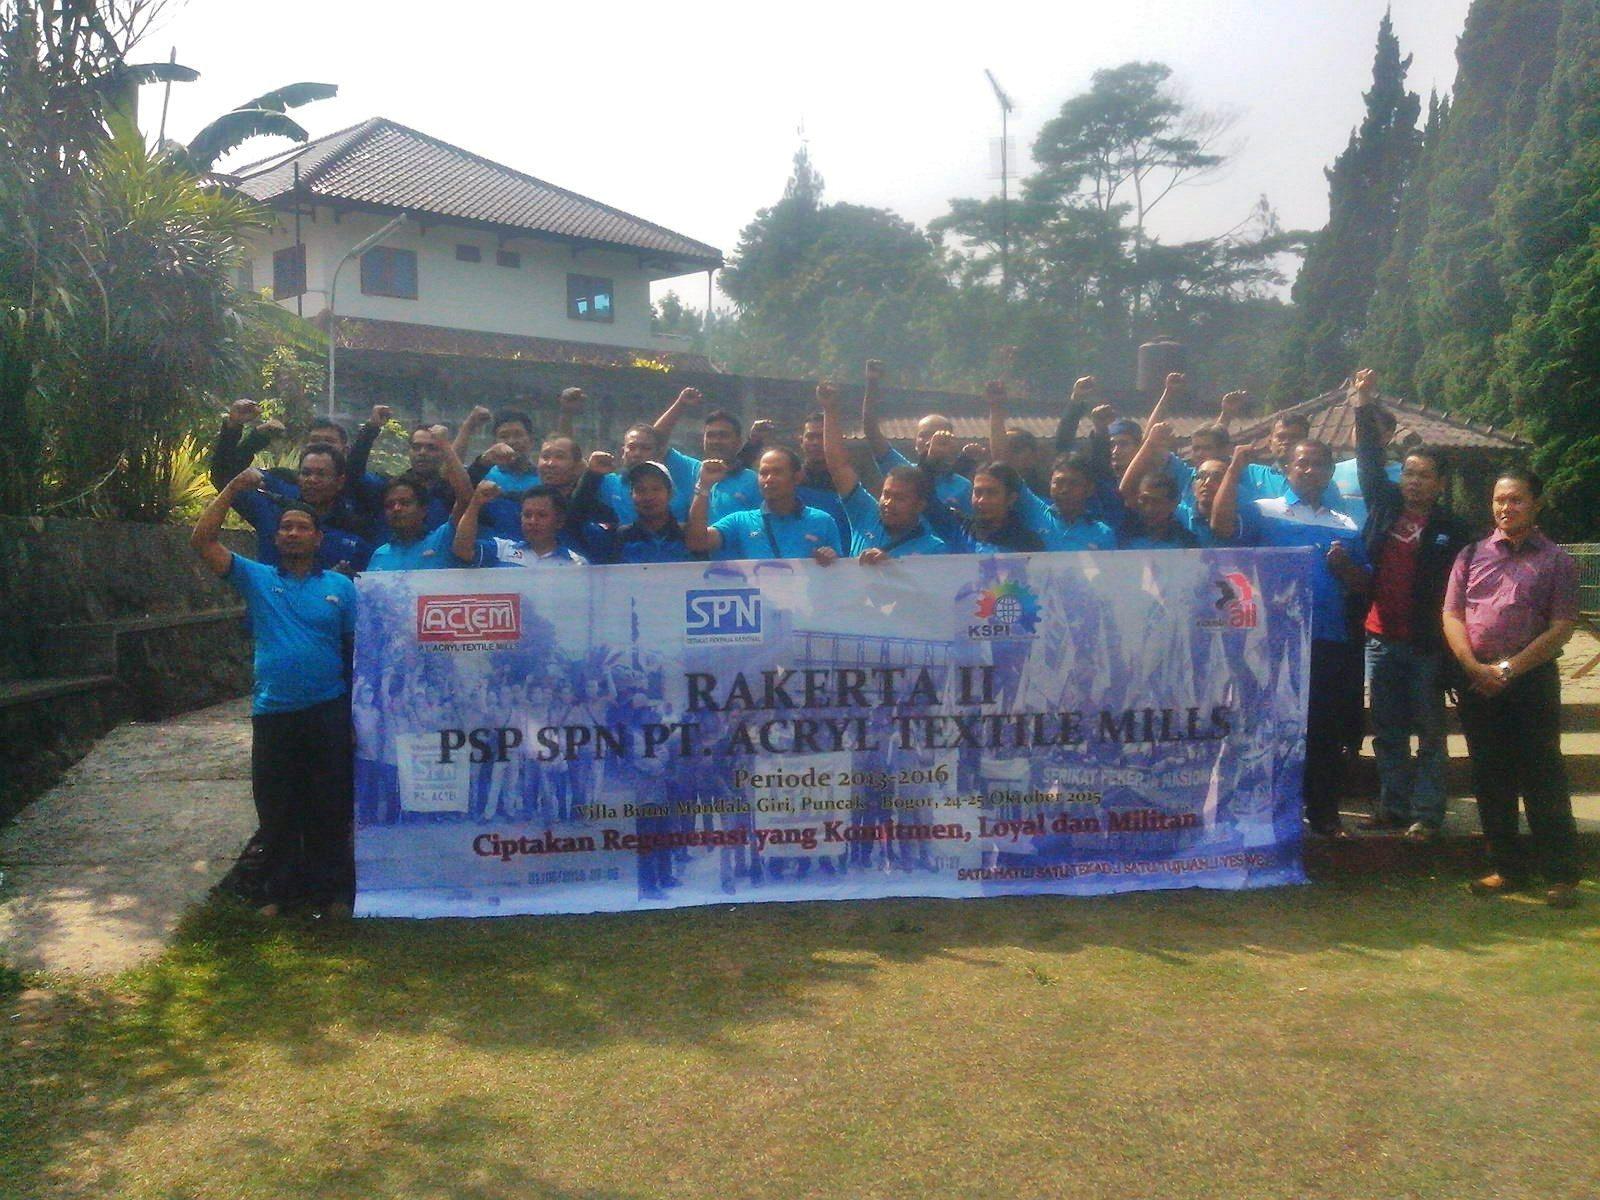 Rakerta II PSP SPN PT ACTEM kota Tanggerang